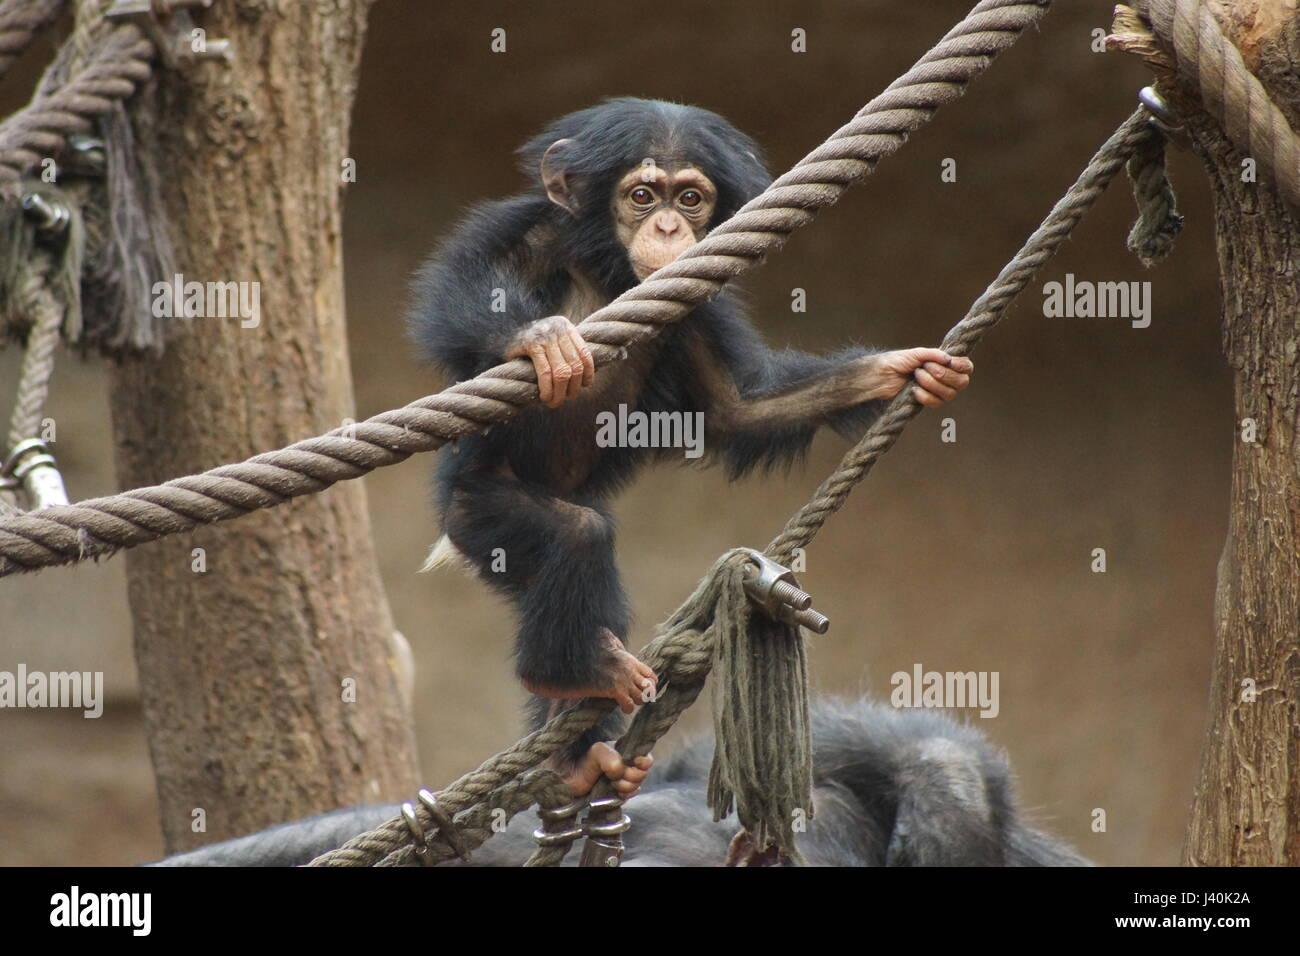 Little chimp - Stock Image